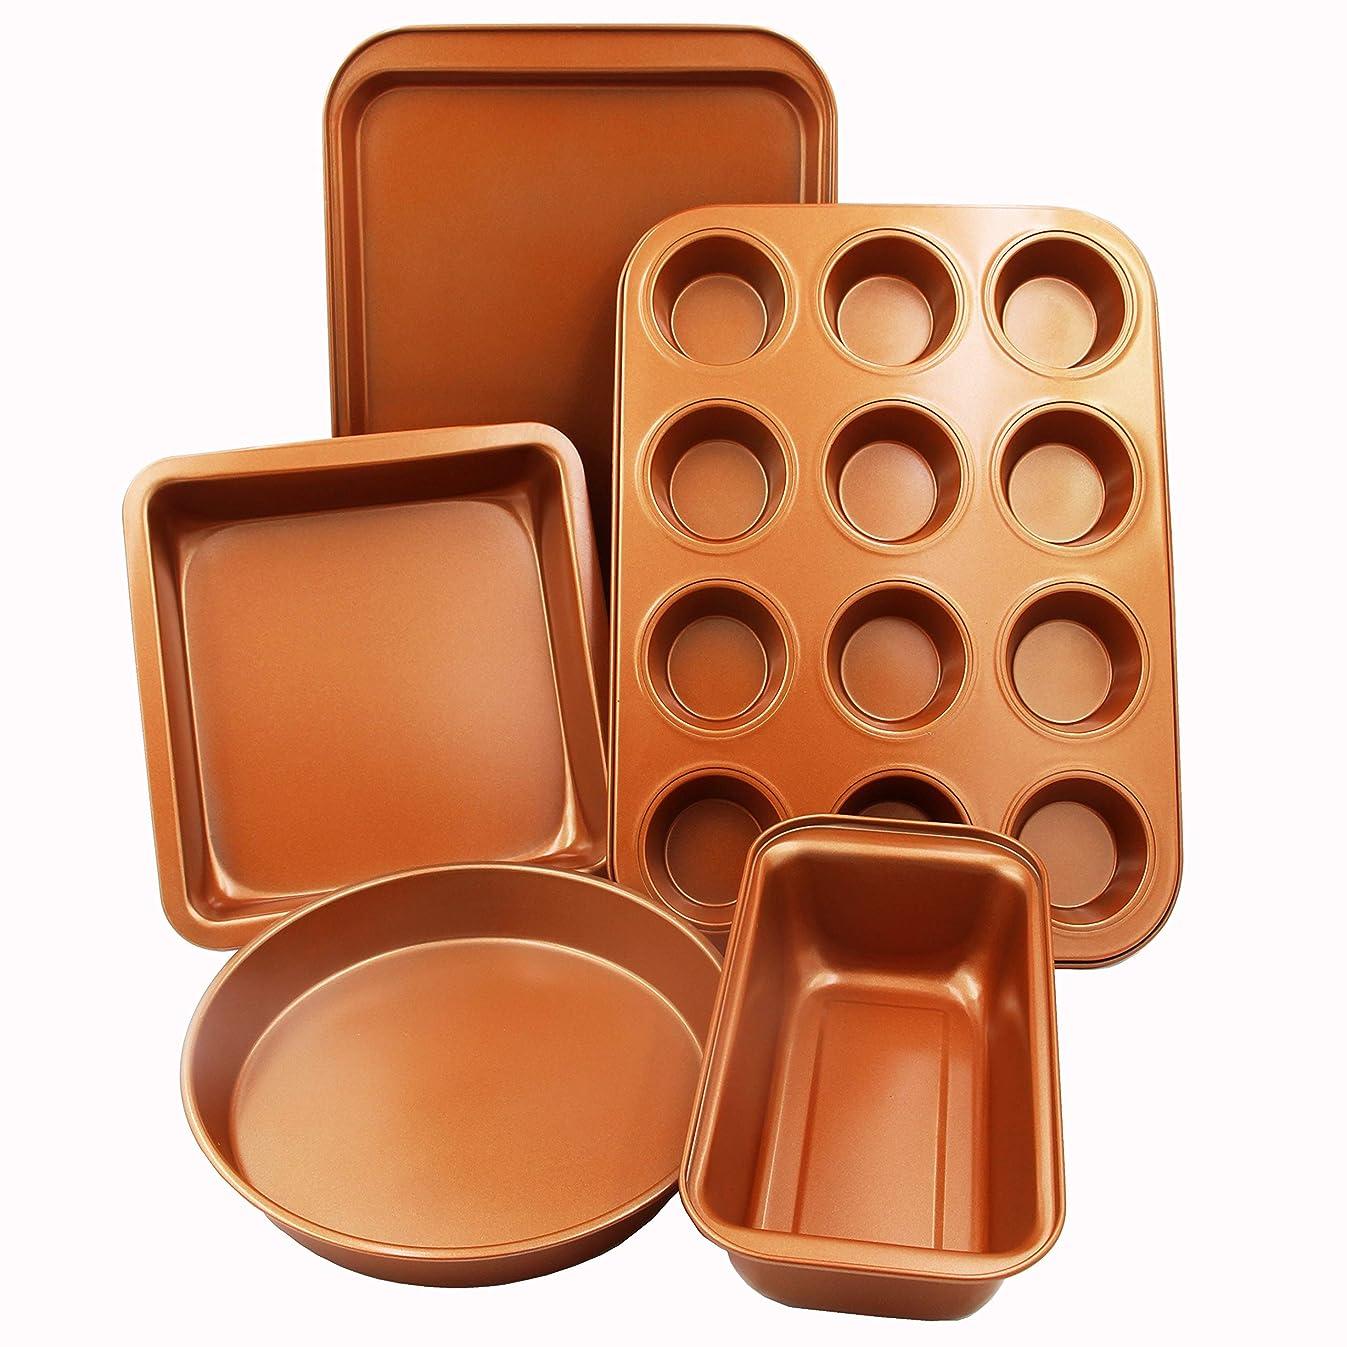 CopperKitchen Baking Pans - 5 pcs Toxic Free NONSTICK - Organic Environmental Friendly Premium Coating – Durable Quality - Muffin Pan, Loaf Pan, Square Pan, Cookie Sheet and Round Pan - BAKEWARE Set